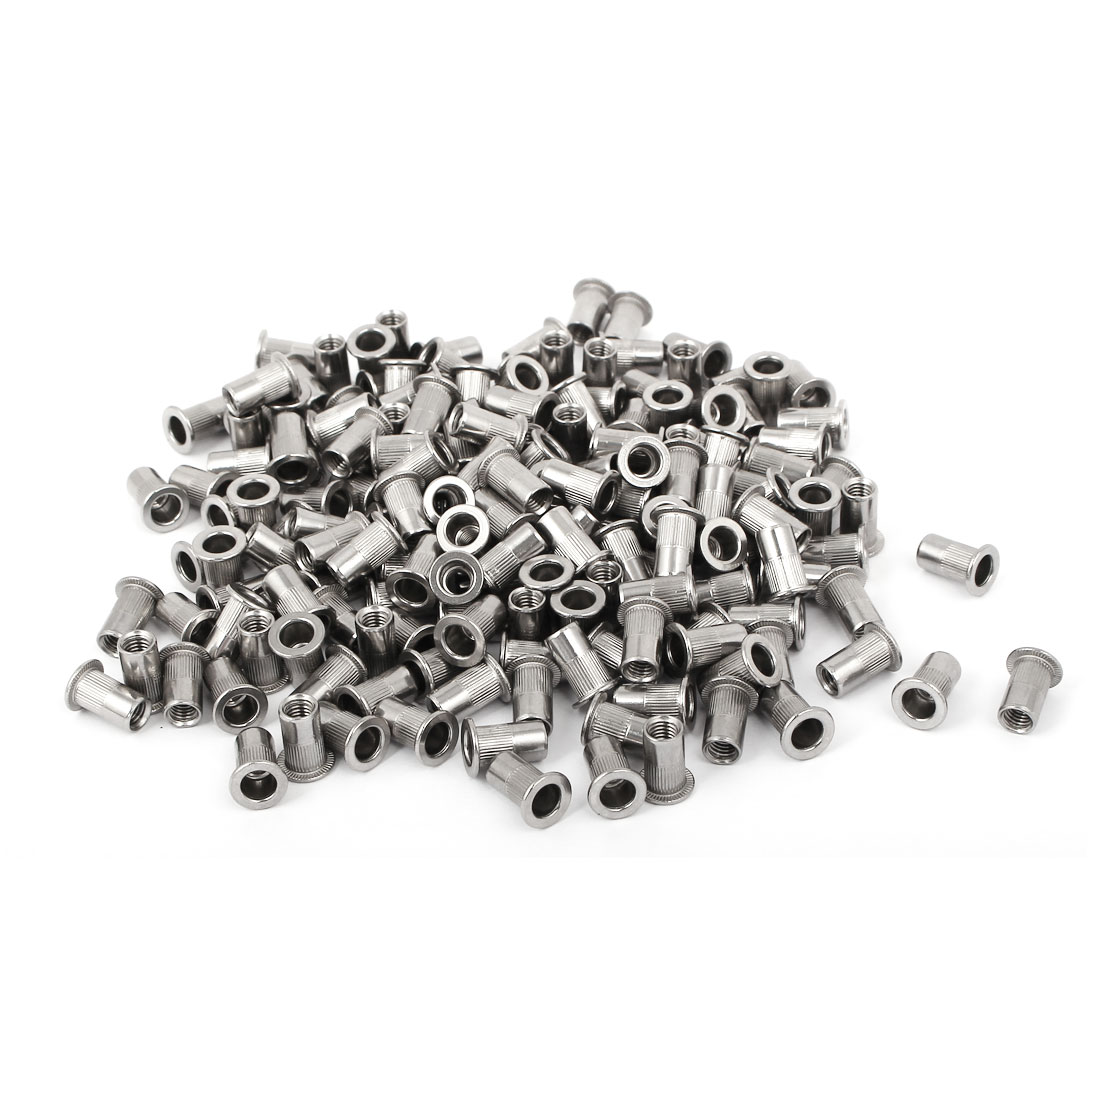 M5 x 13mm 304 Stainless Steel Knurled Blind Rivet Nut Insert Nutsert 200PCS